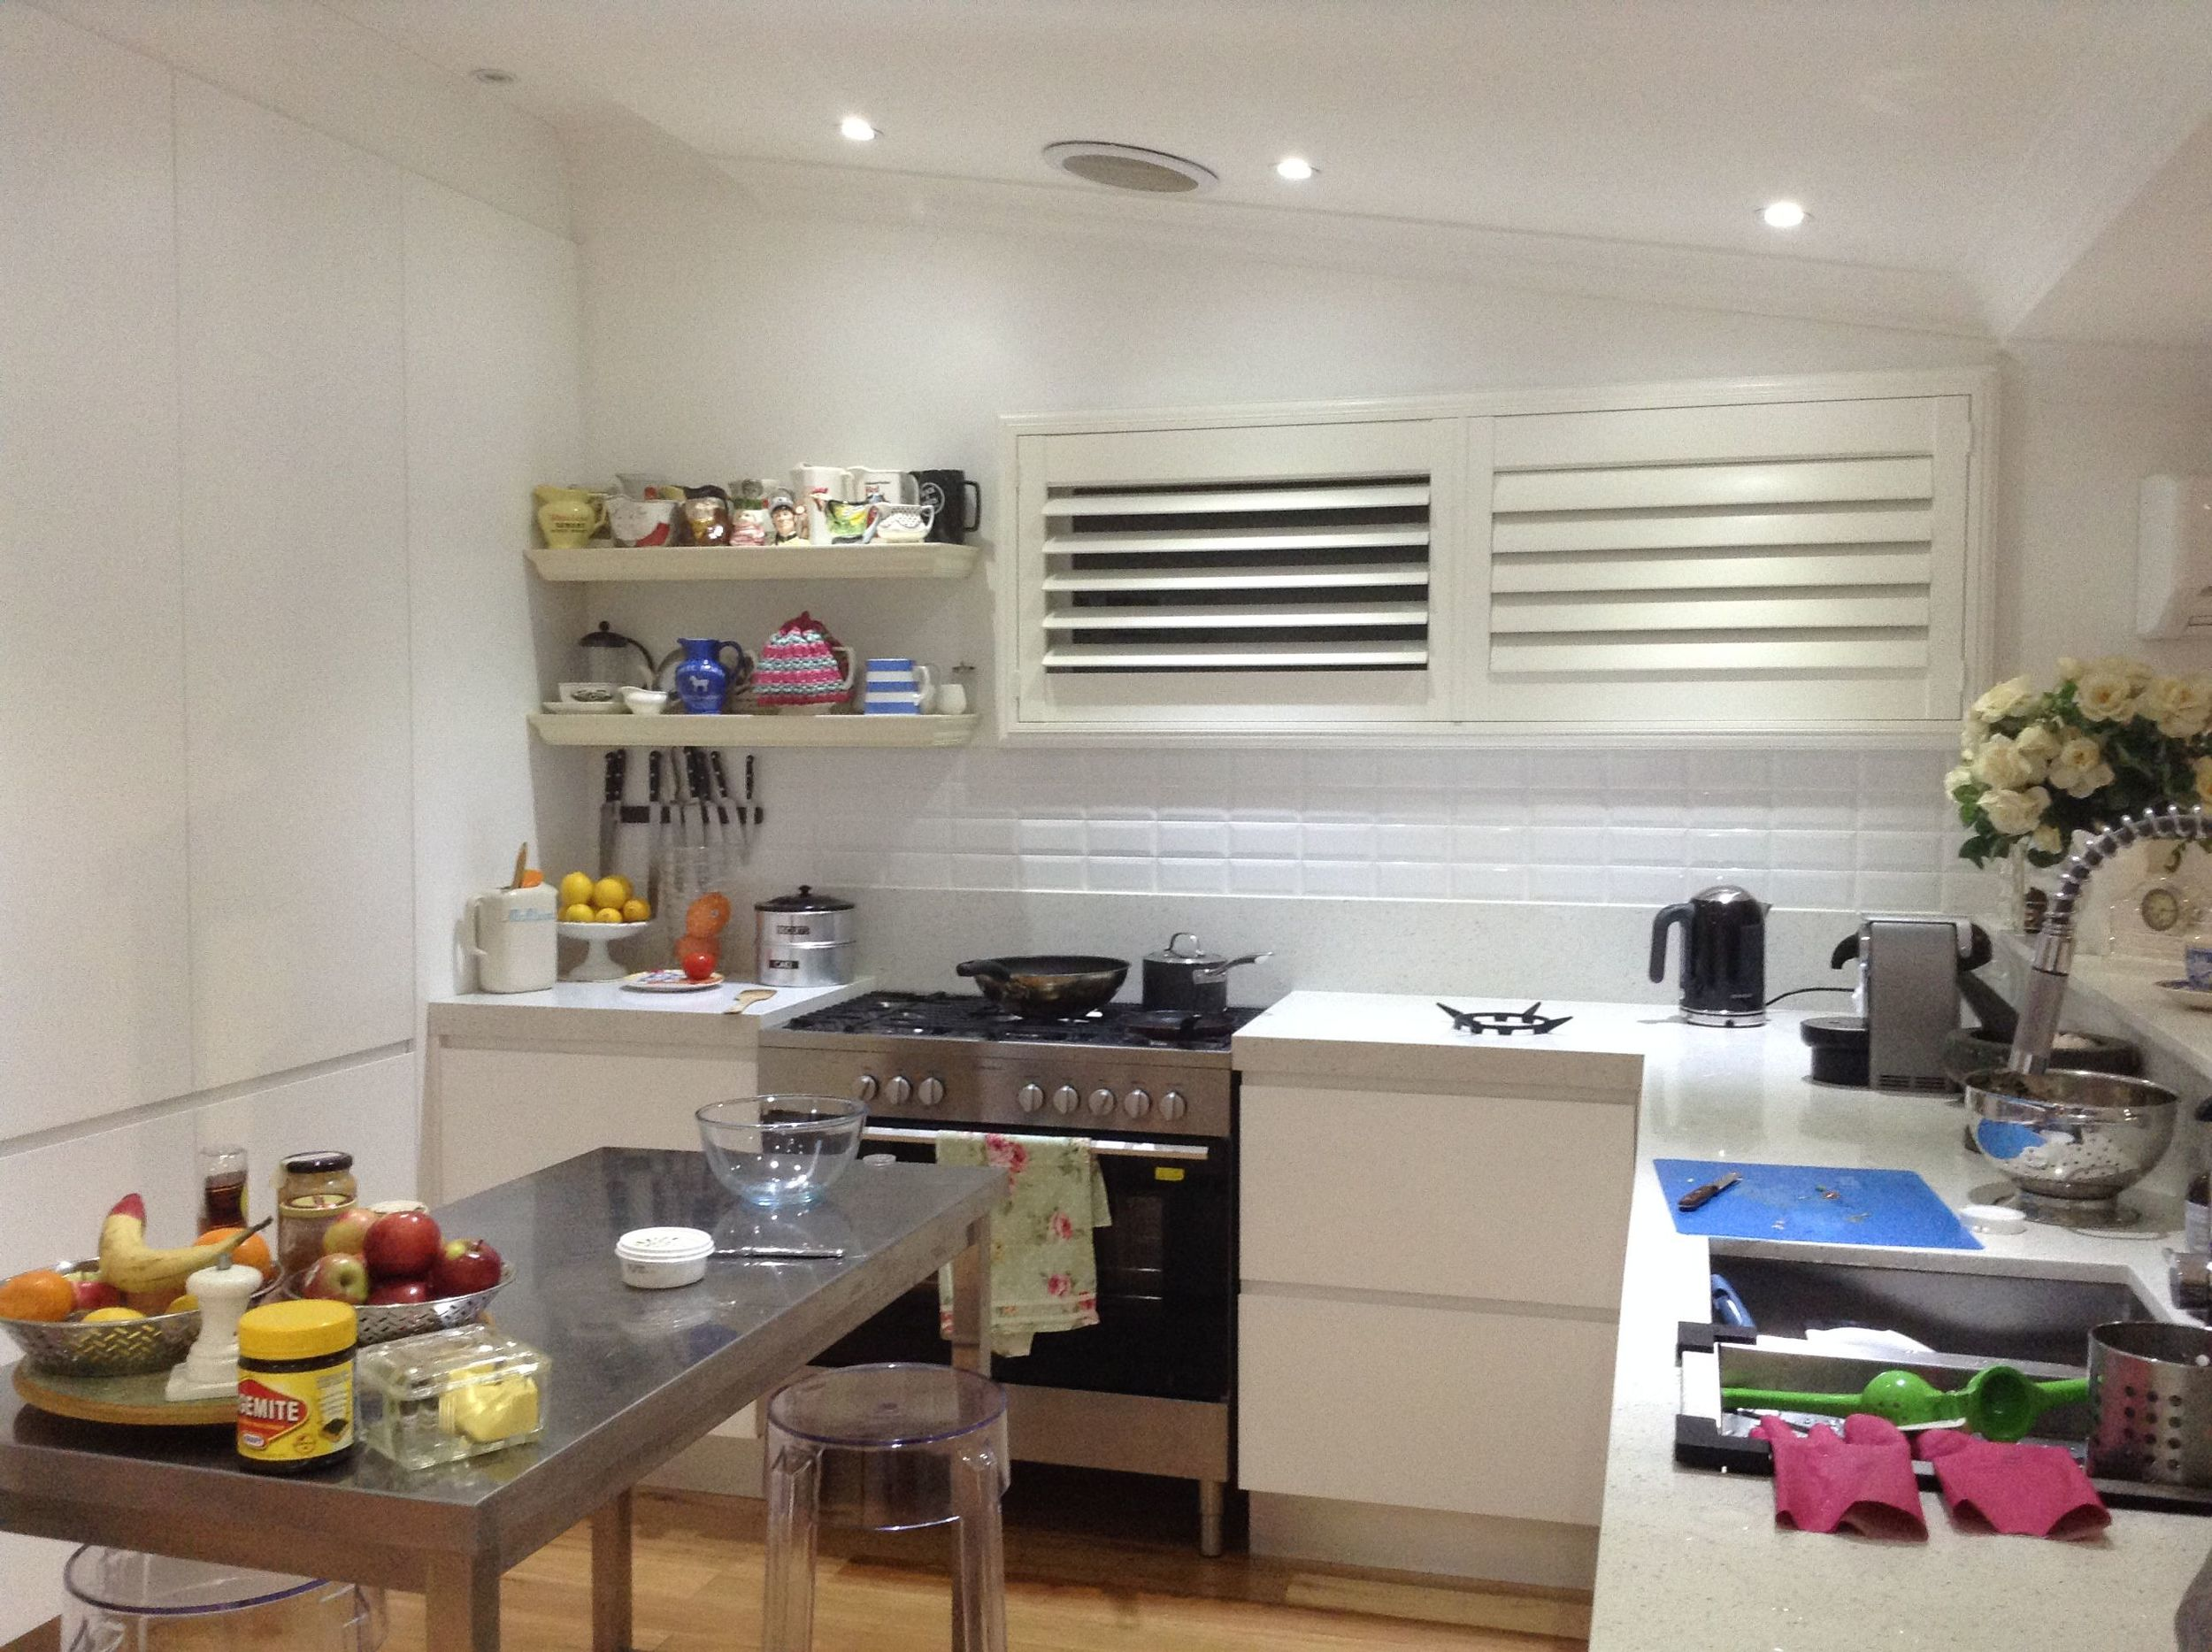 KitchenLithgow.jpg